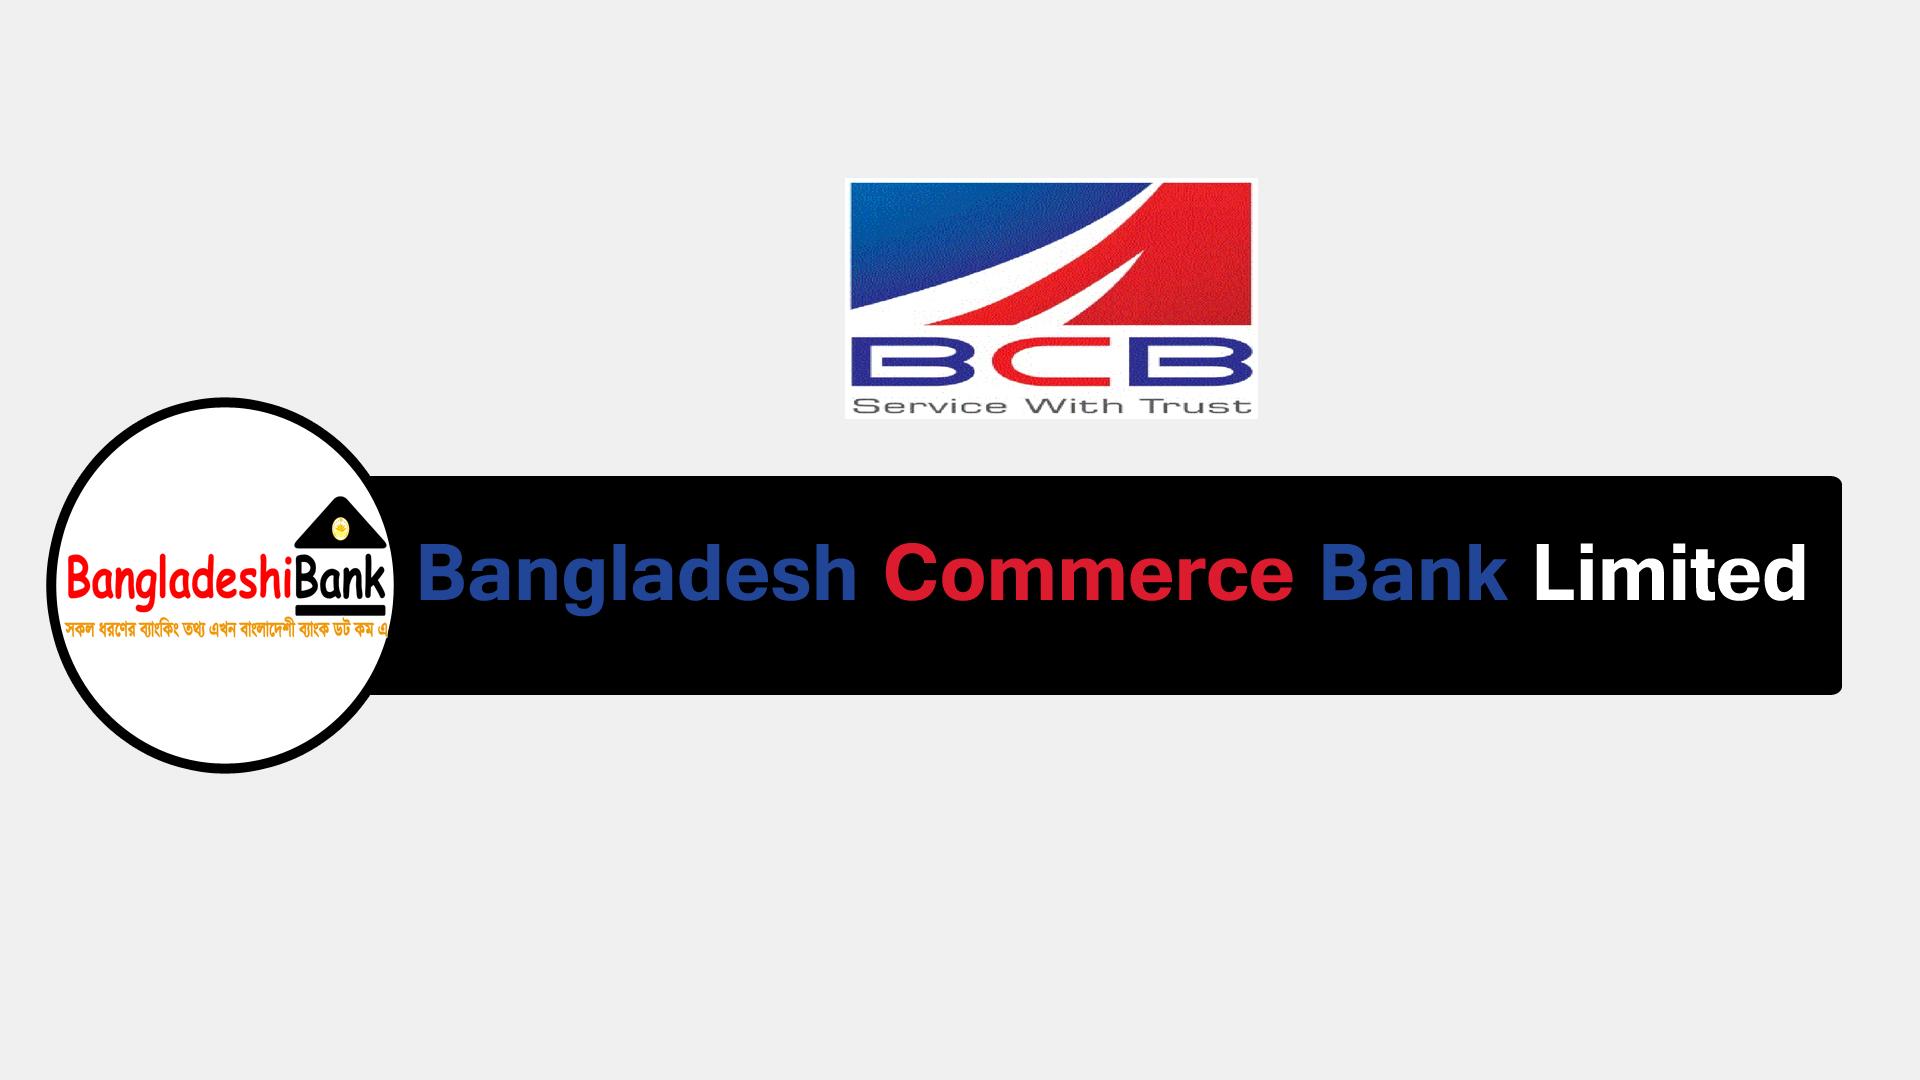 Bangladesh Commerce Bank Limited